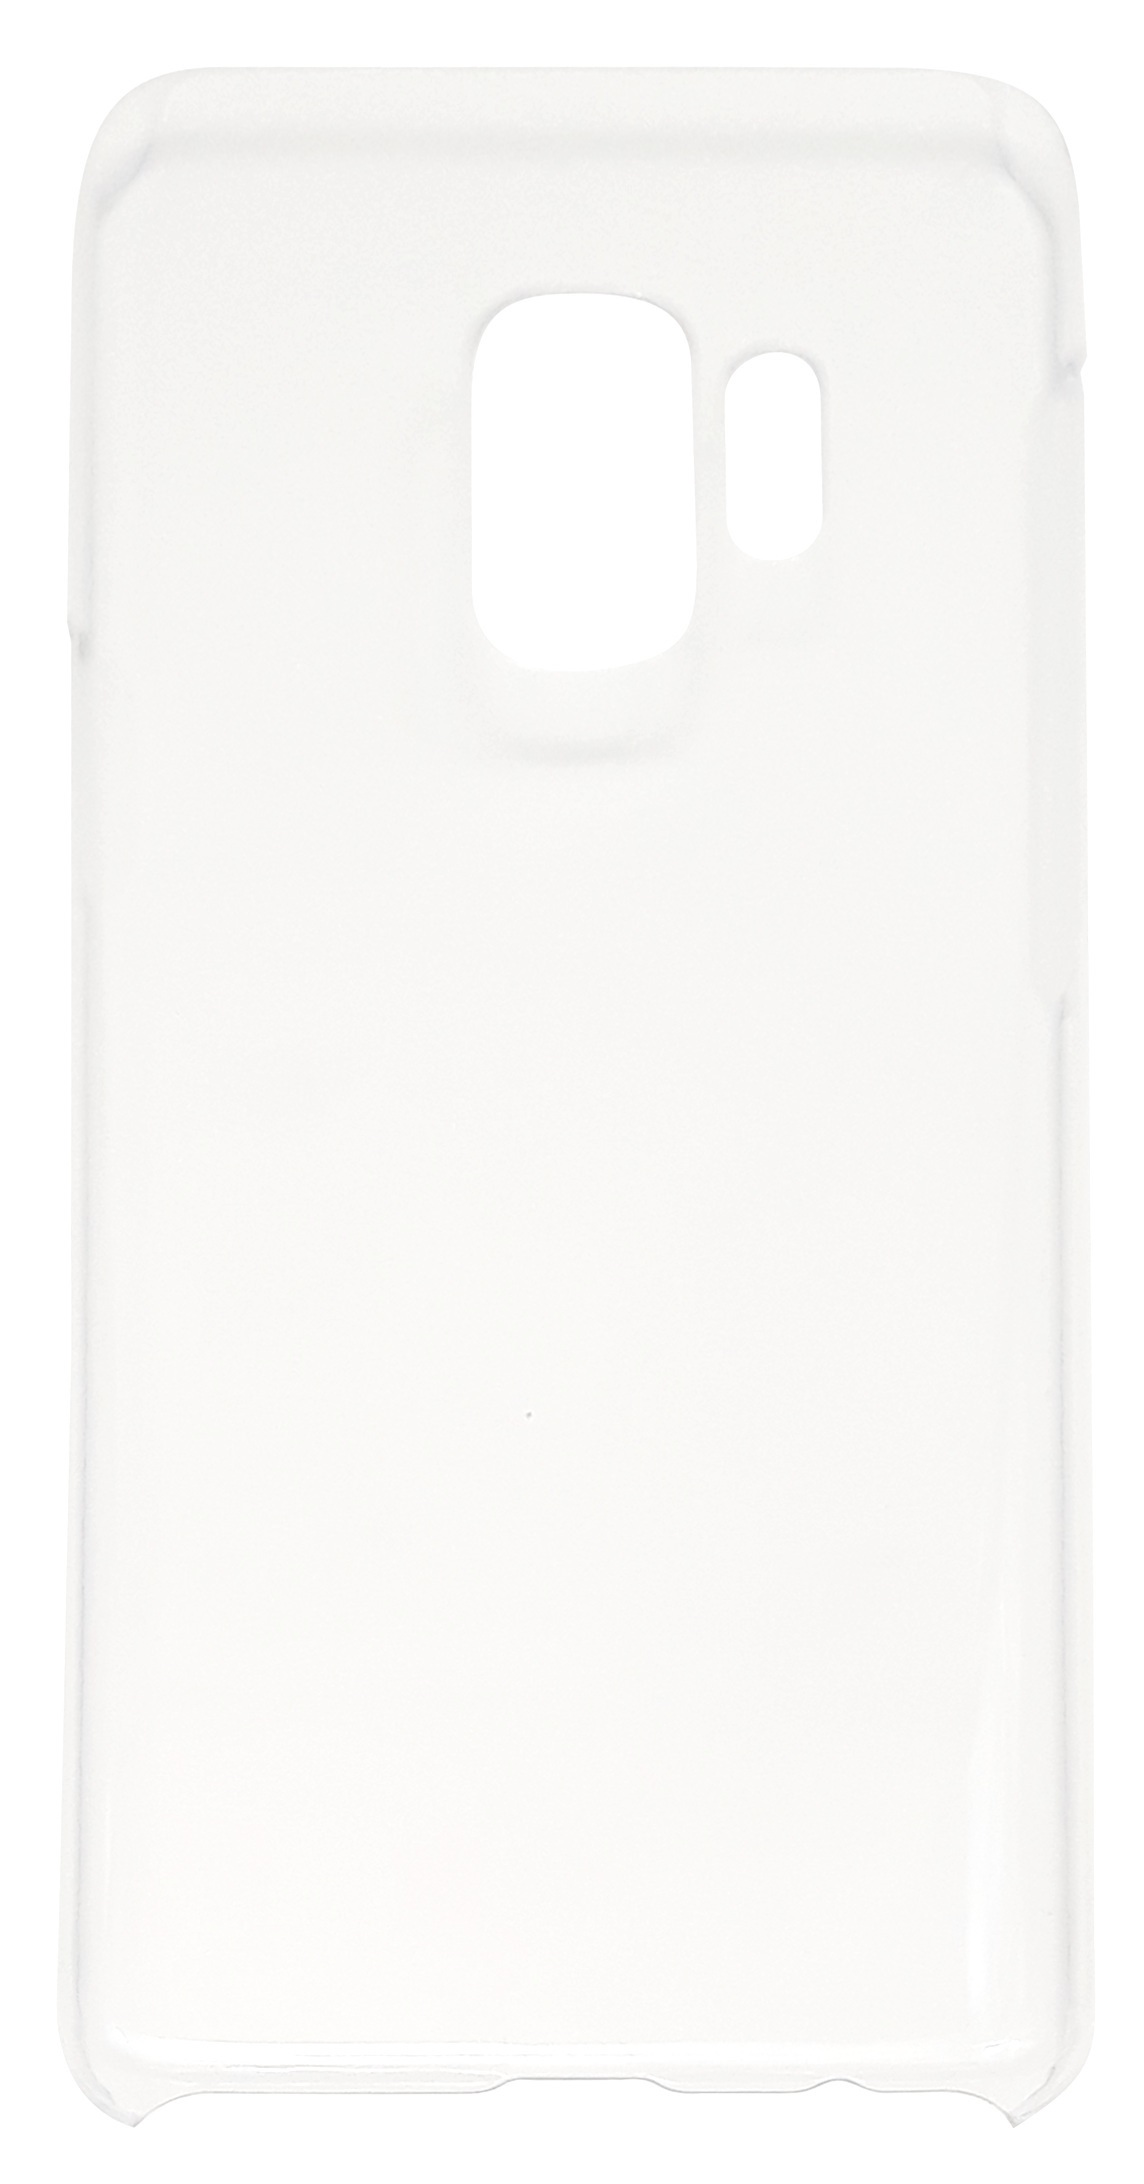 Husa capac spate Zmeurino transparent pentru Samsung Galaxy S9